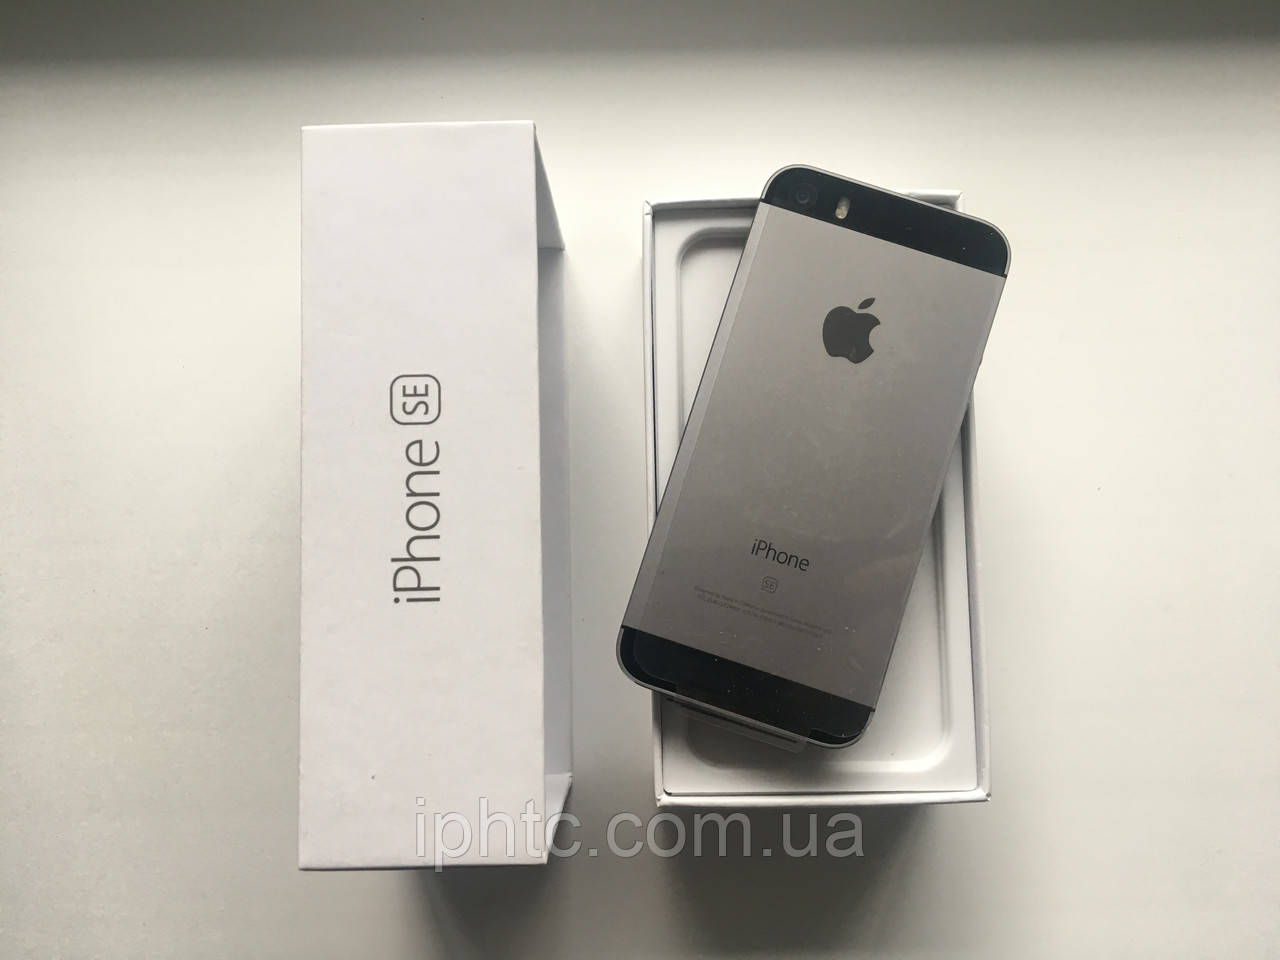 Apple iPhone SE 16GB Grey 4G /Новый / NeverLock, фото 1